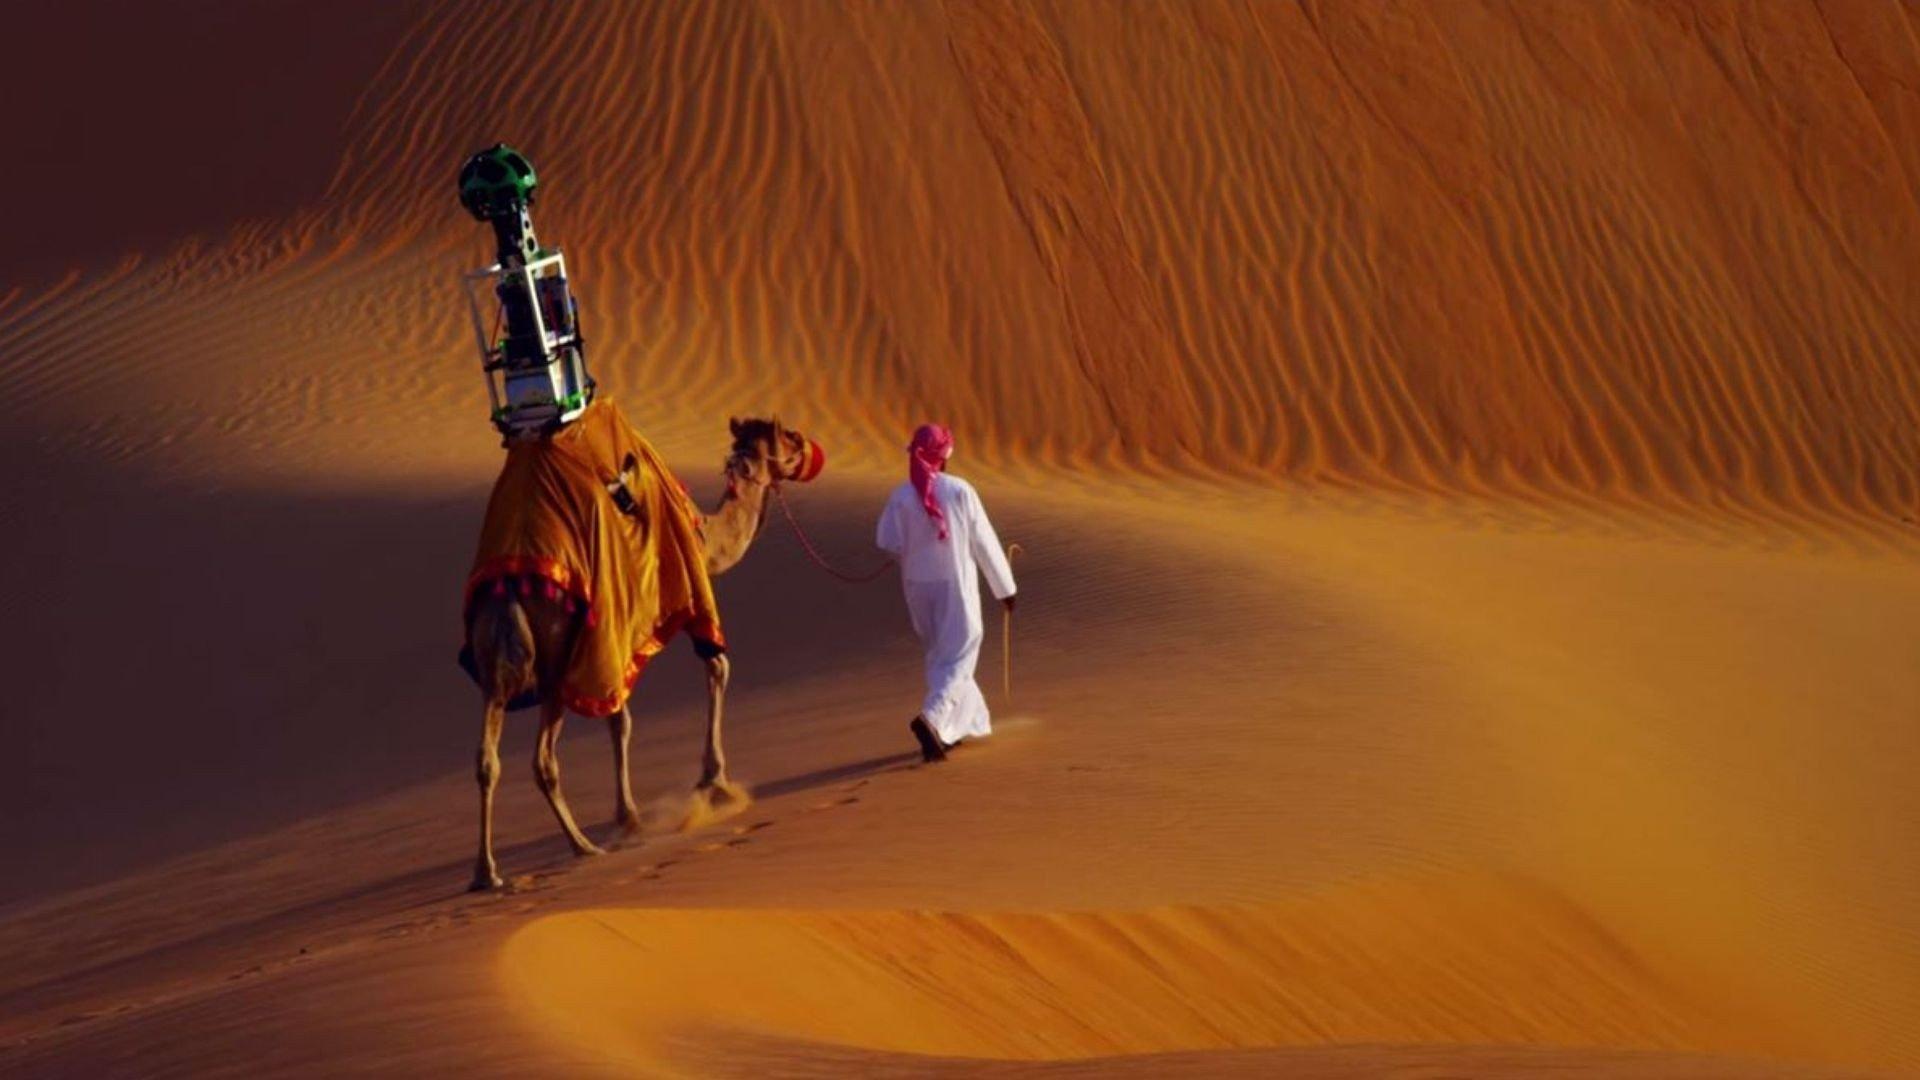 Wallpaper 1920x1080 Px Camels Camera Desert Google